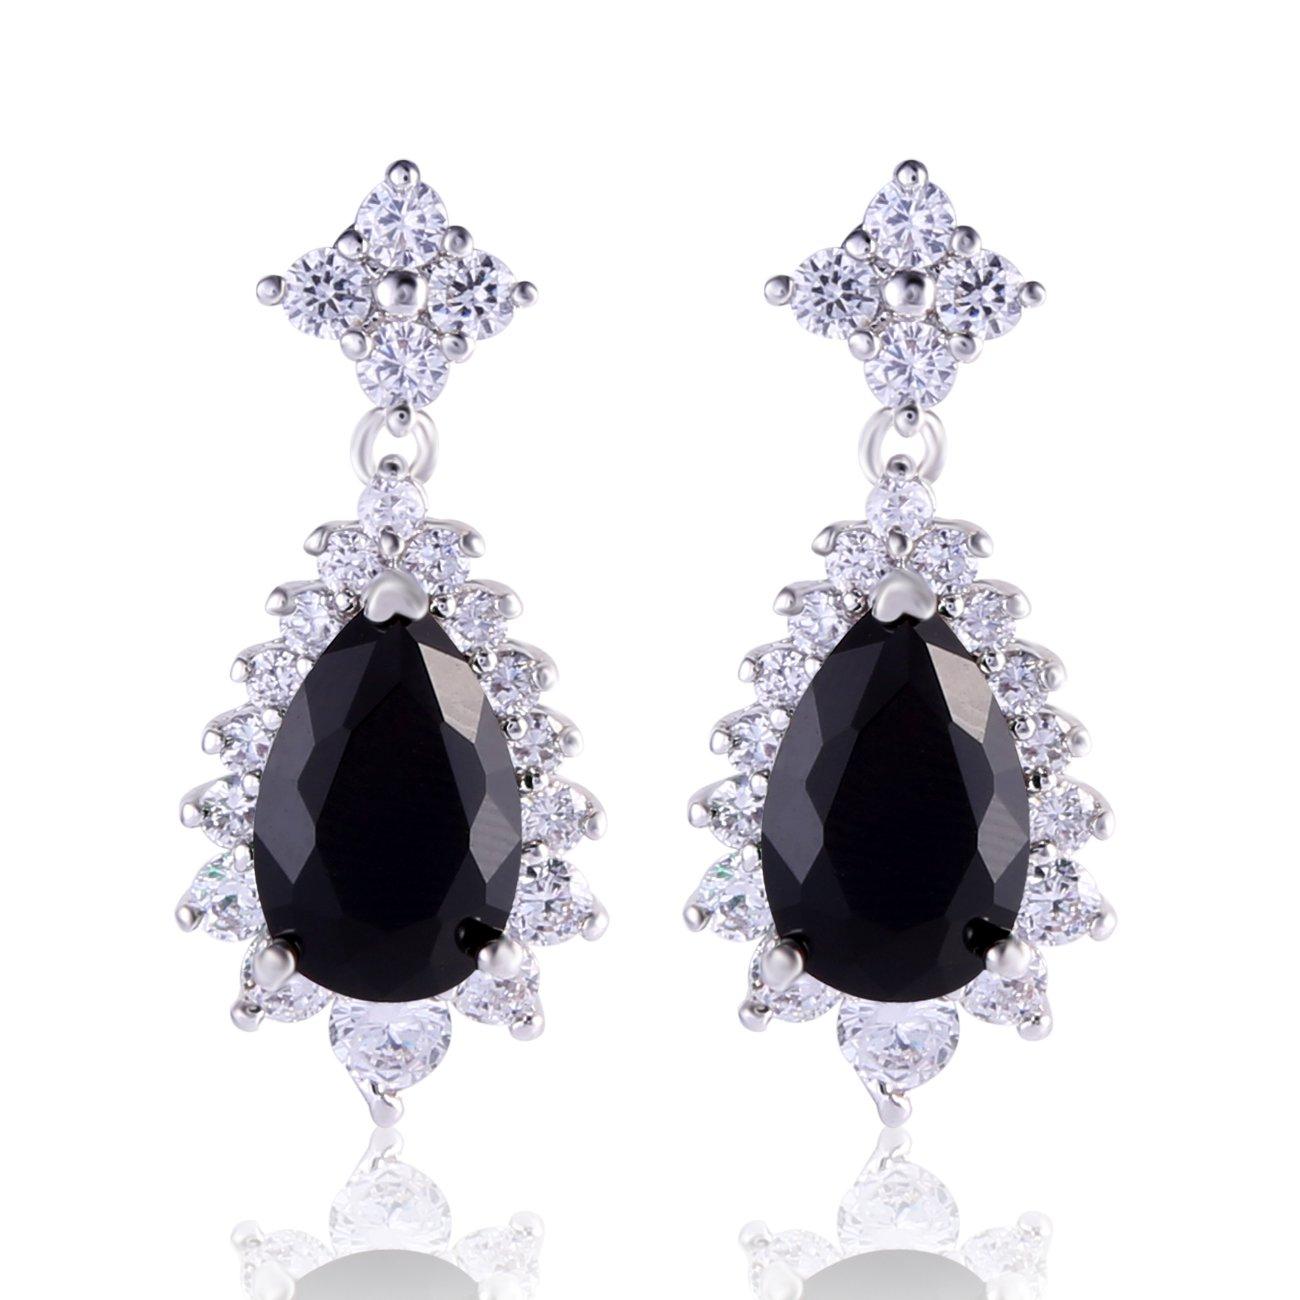 GULICX Vogue style Silver Tone Bule Sapphire Color Cubic Zirconia Fit Party Dangle Earrings